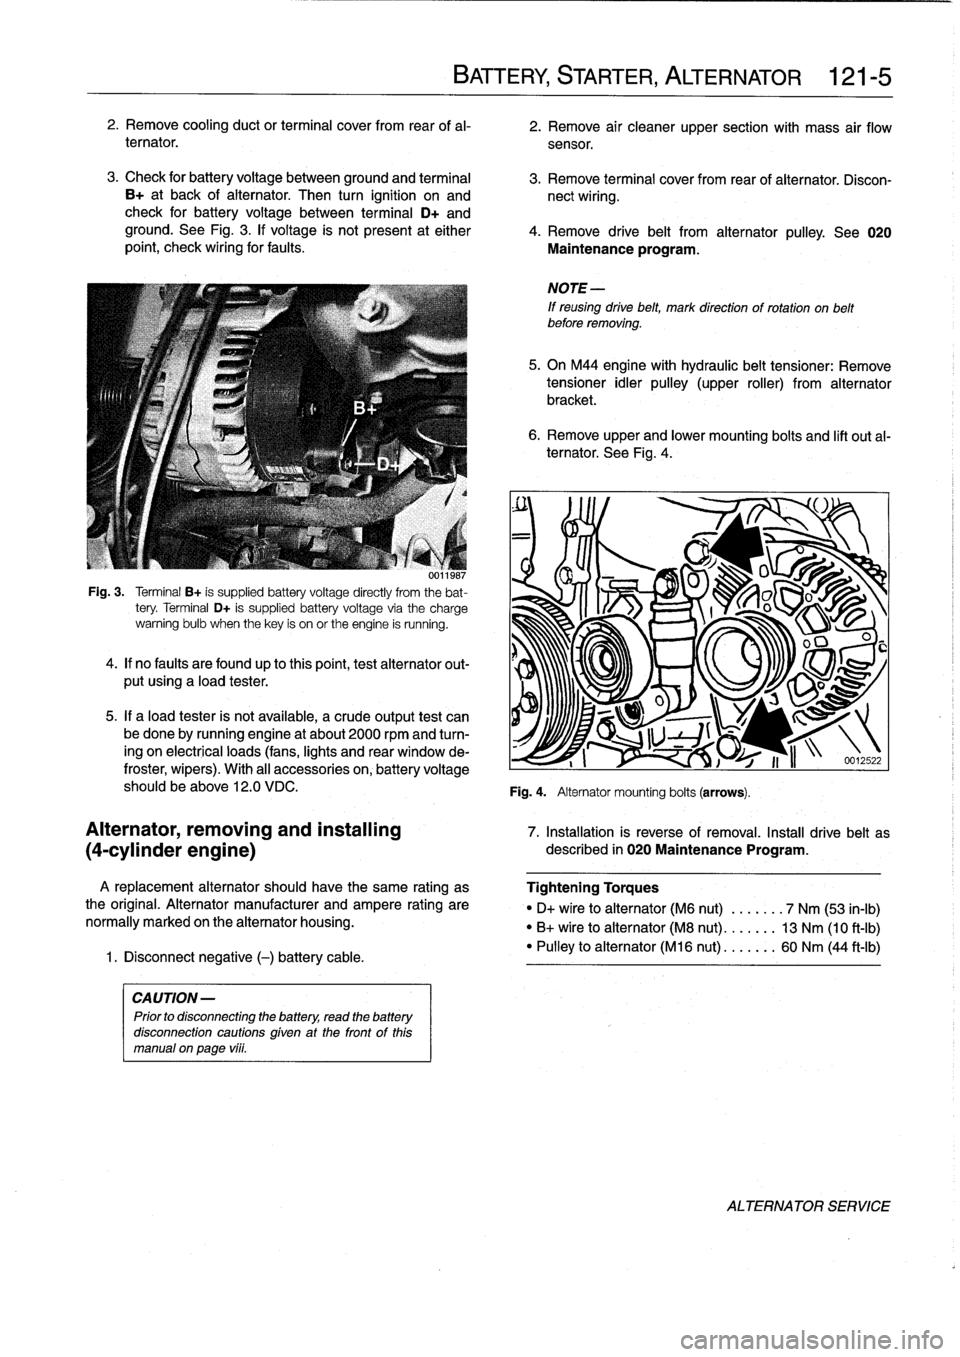 bulb bmw m3 1996 e36 workshop manual